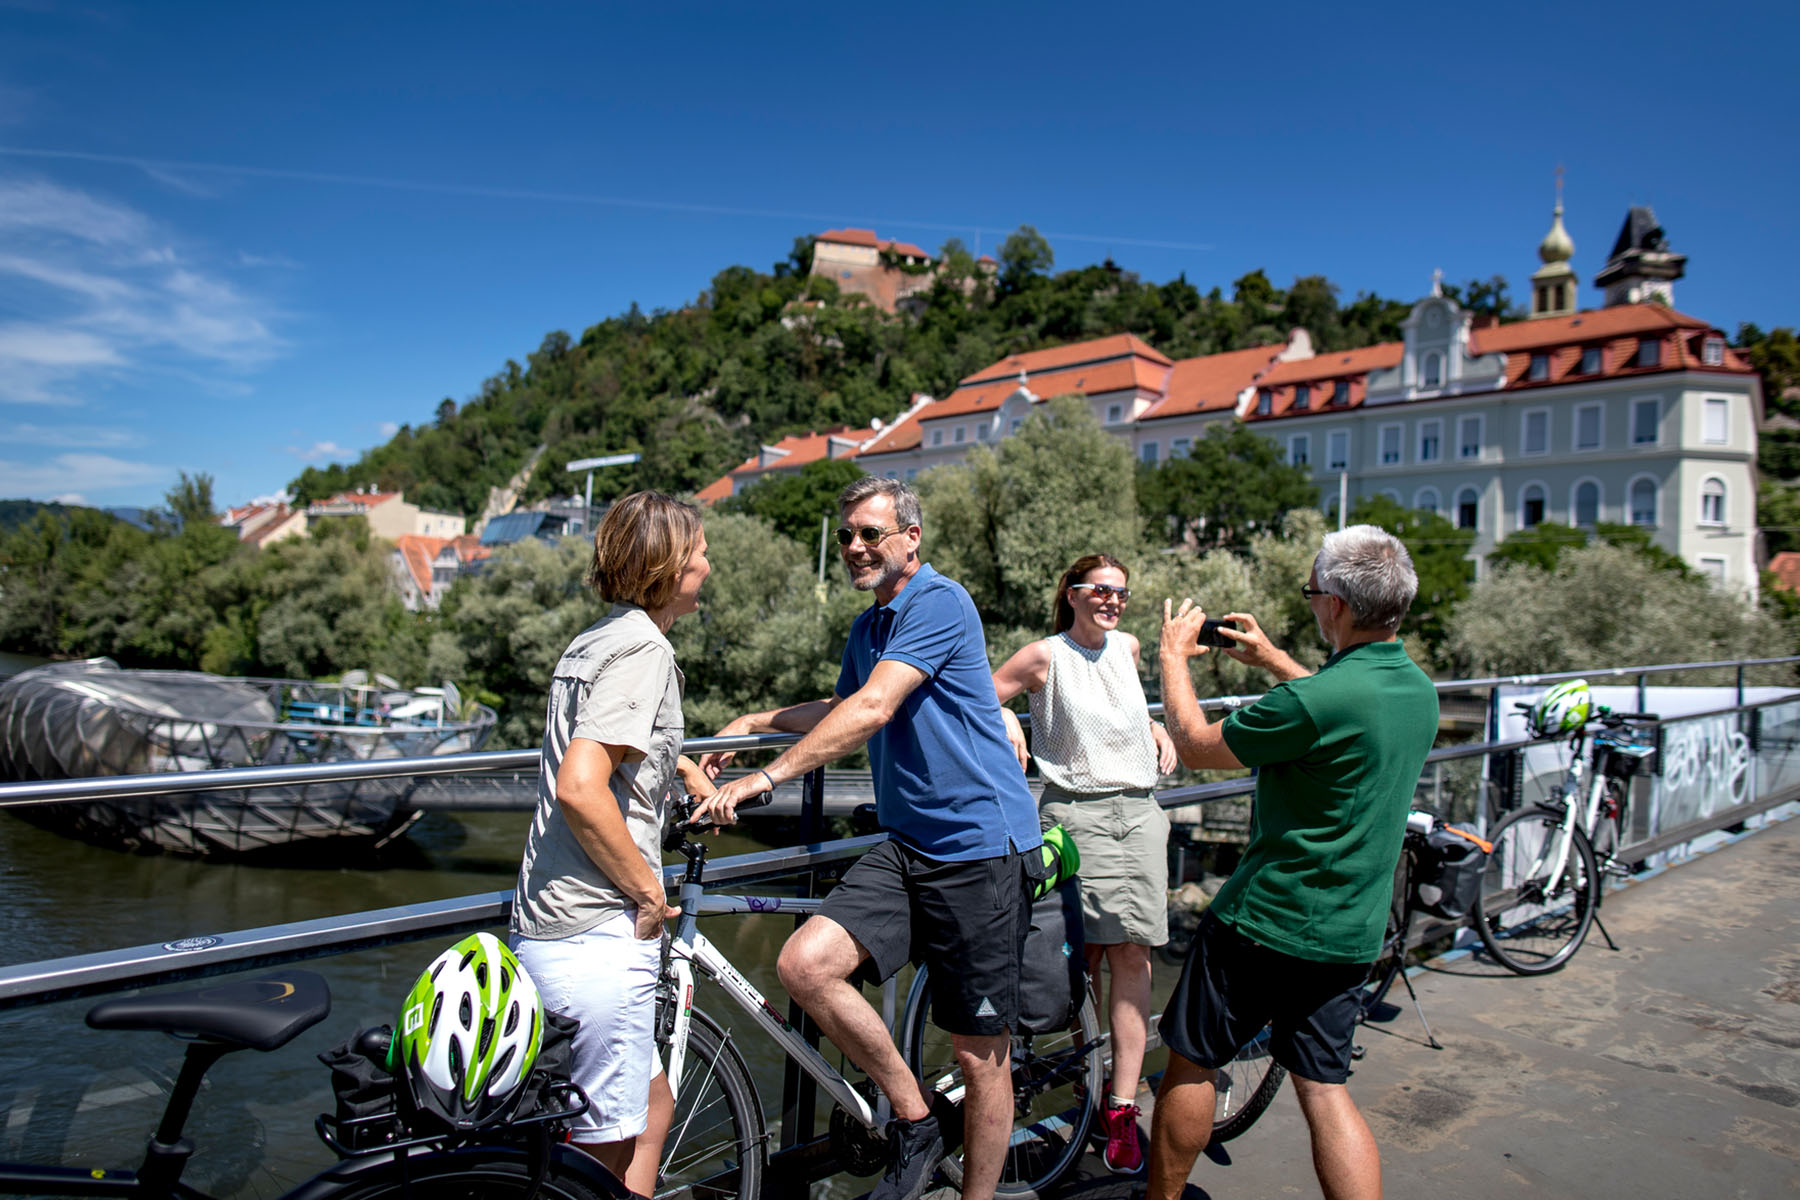 slider_relax_and_dine_0000_Rad in Graz (c) Graz Tourismus - Tom Lamm